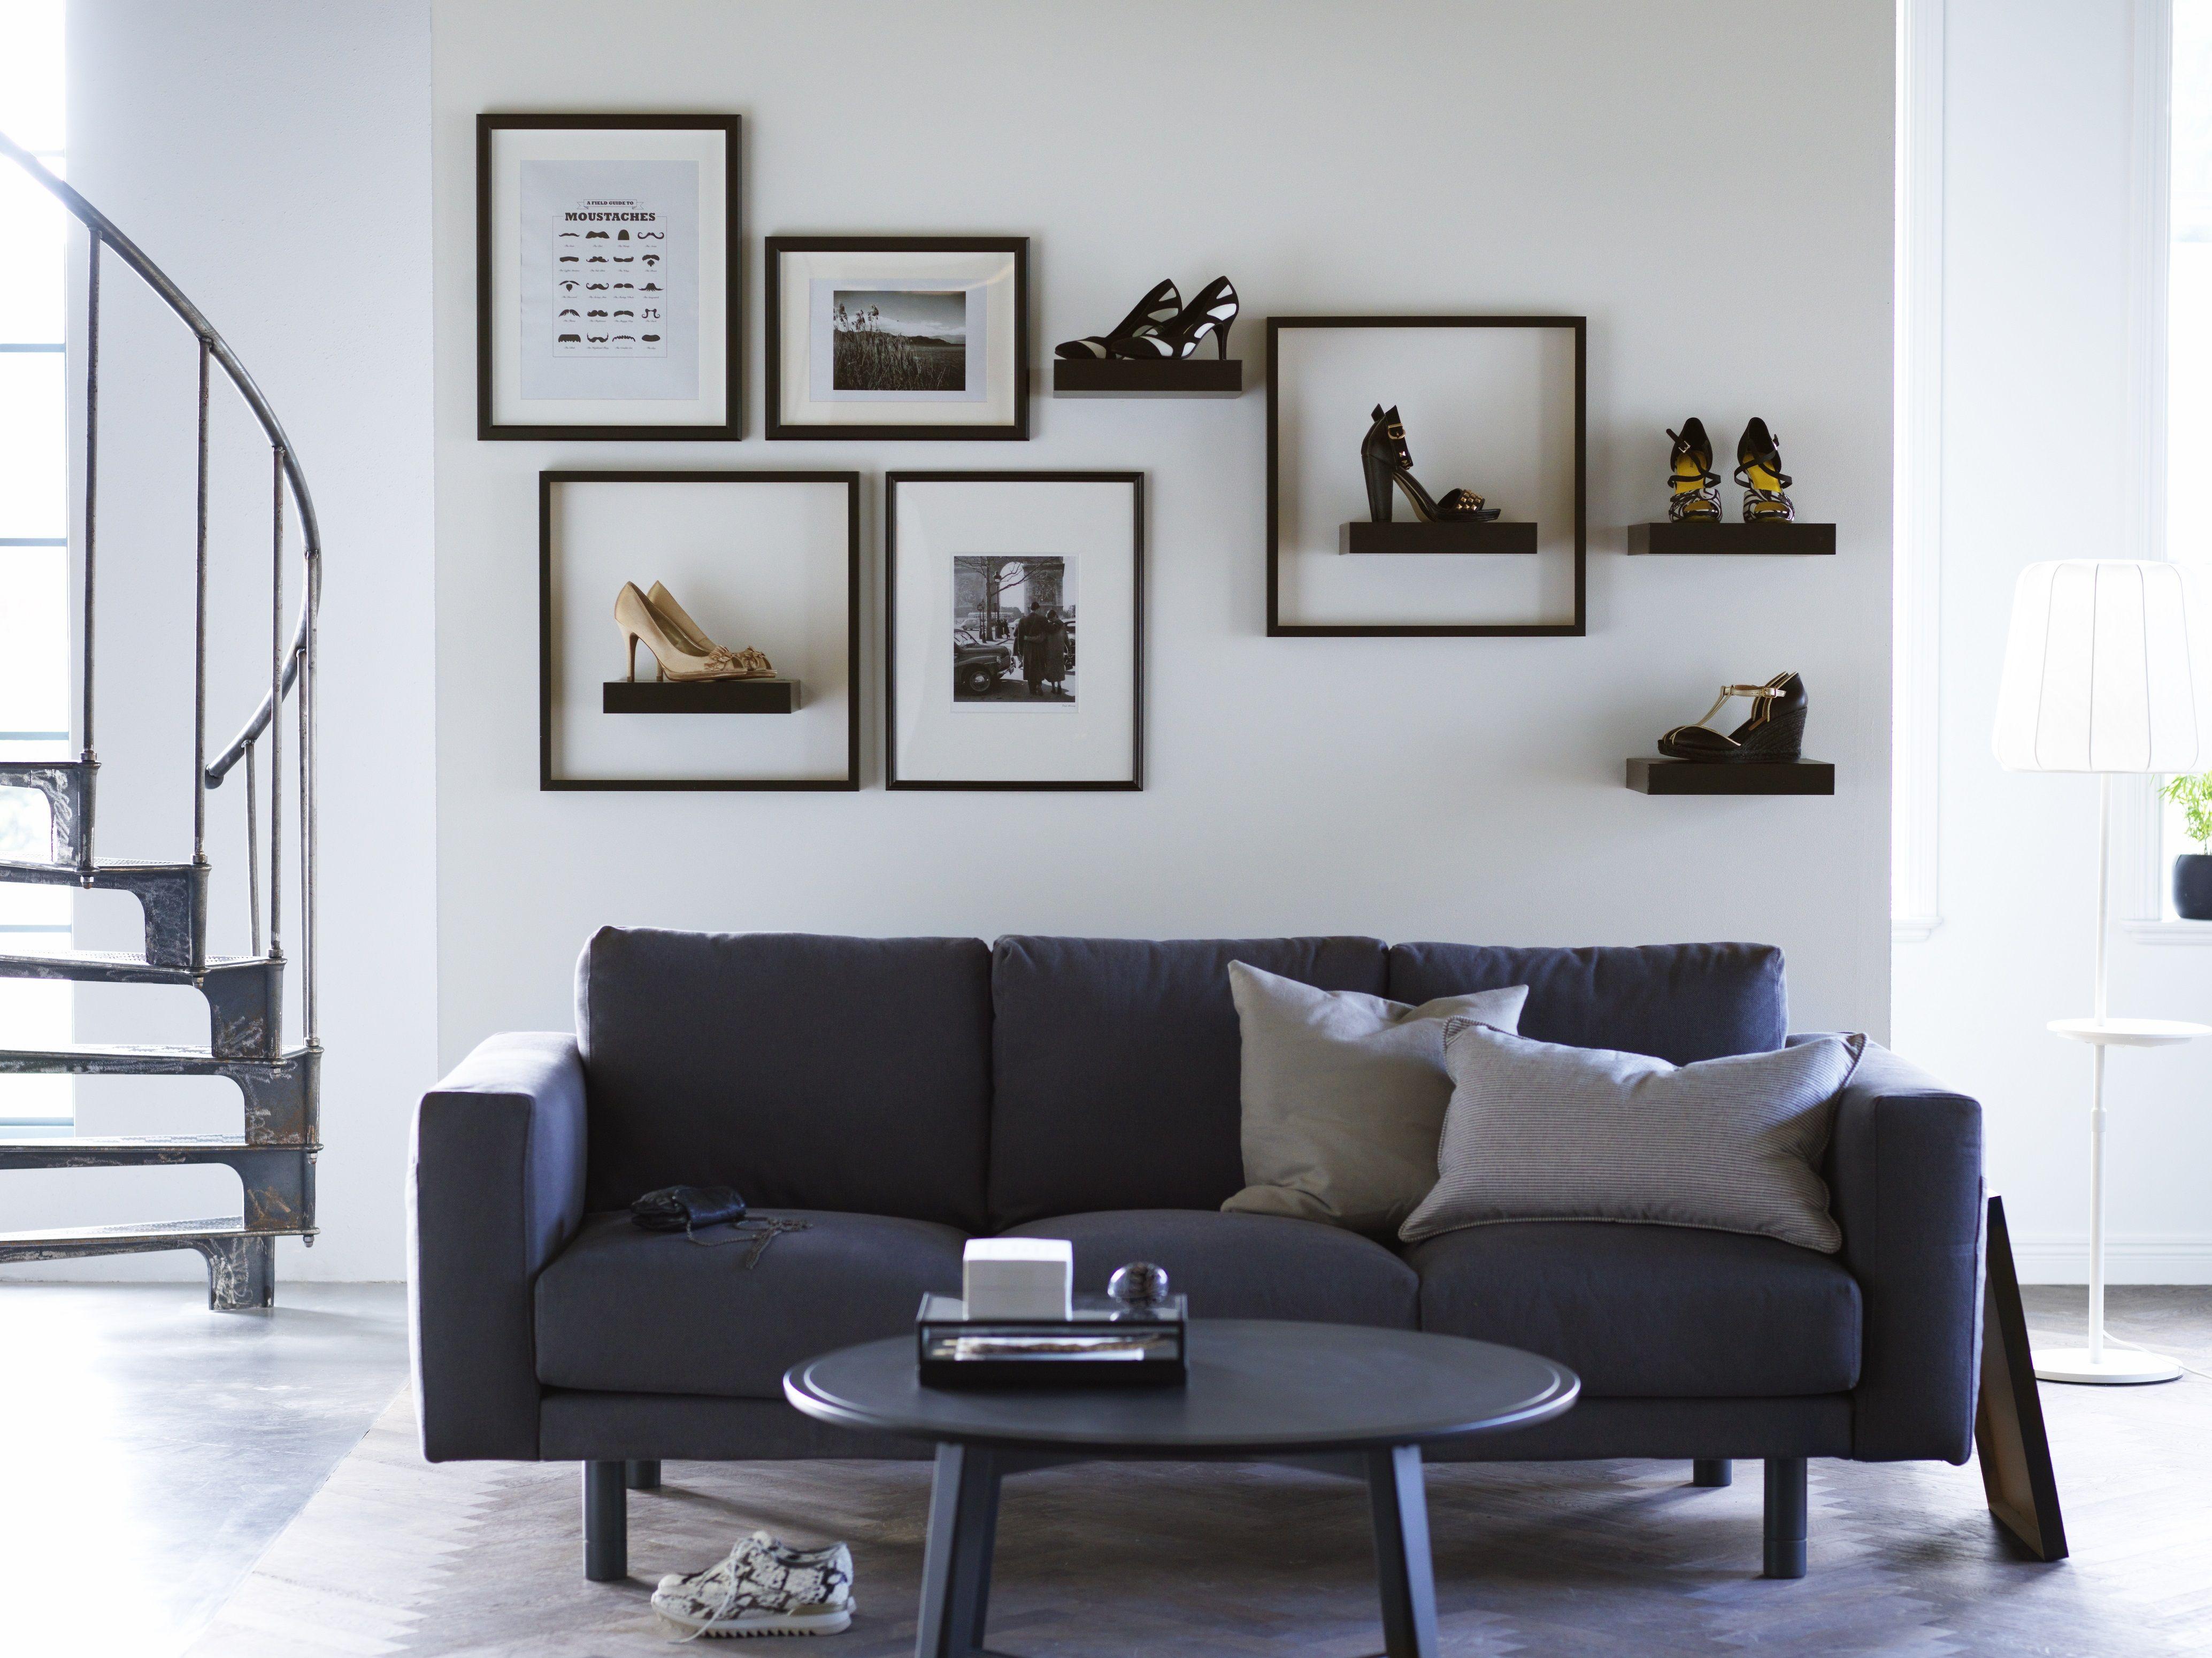 norsborg 3 zitsbank ikea ikeanl bank donkergrijs zithoek interieur woonkamers. Black Bedroom Furniture Sets. Home Design Ideas